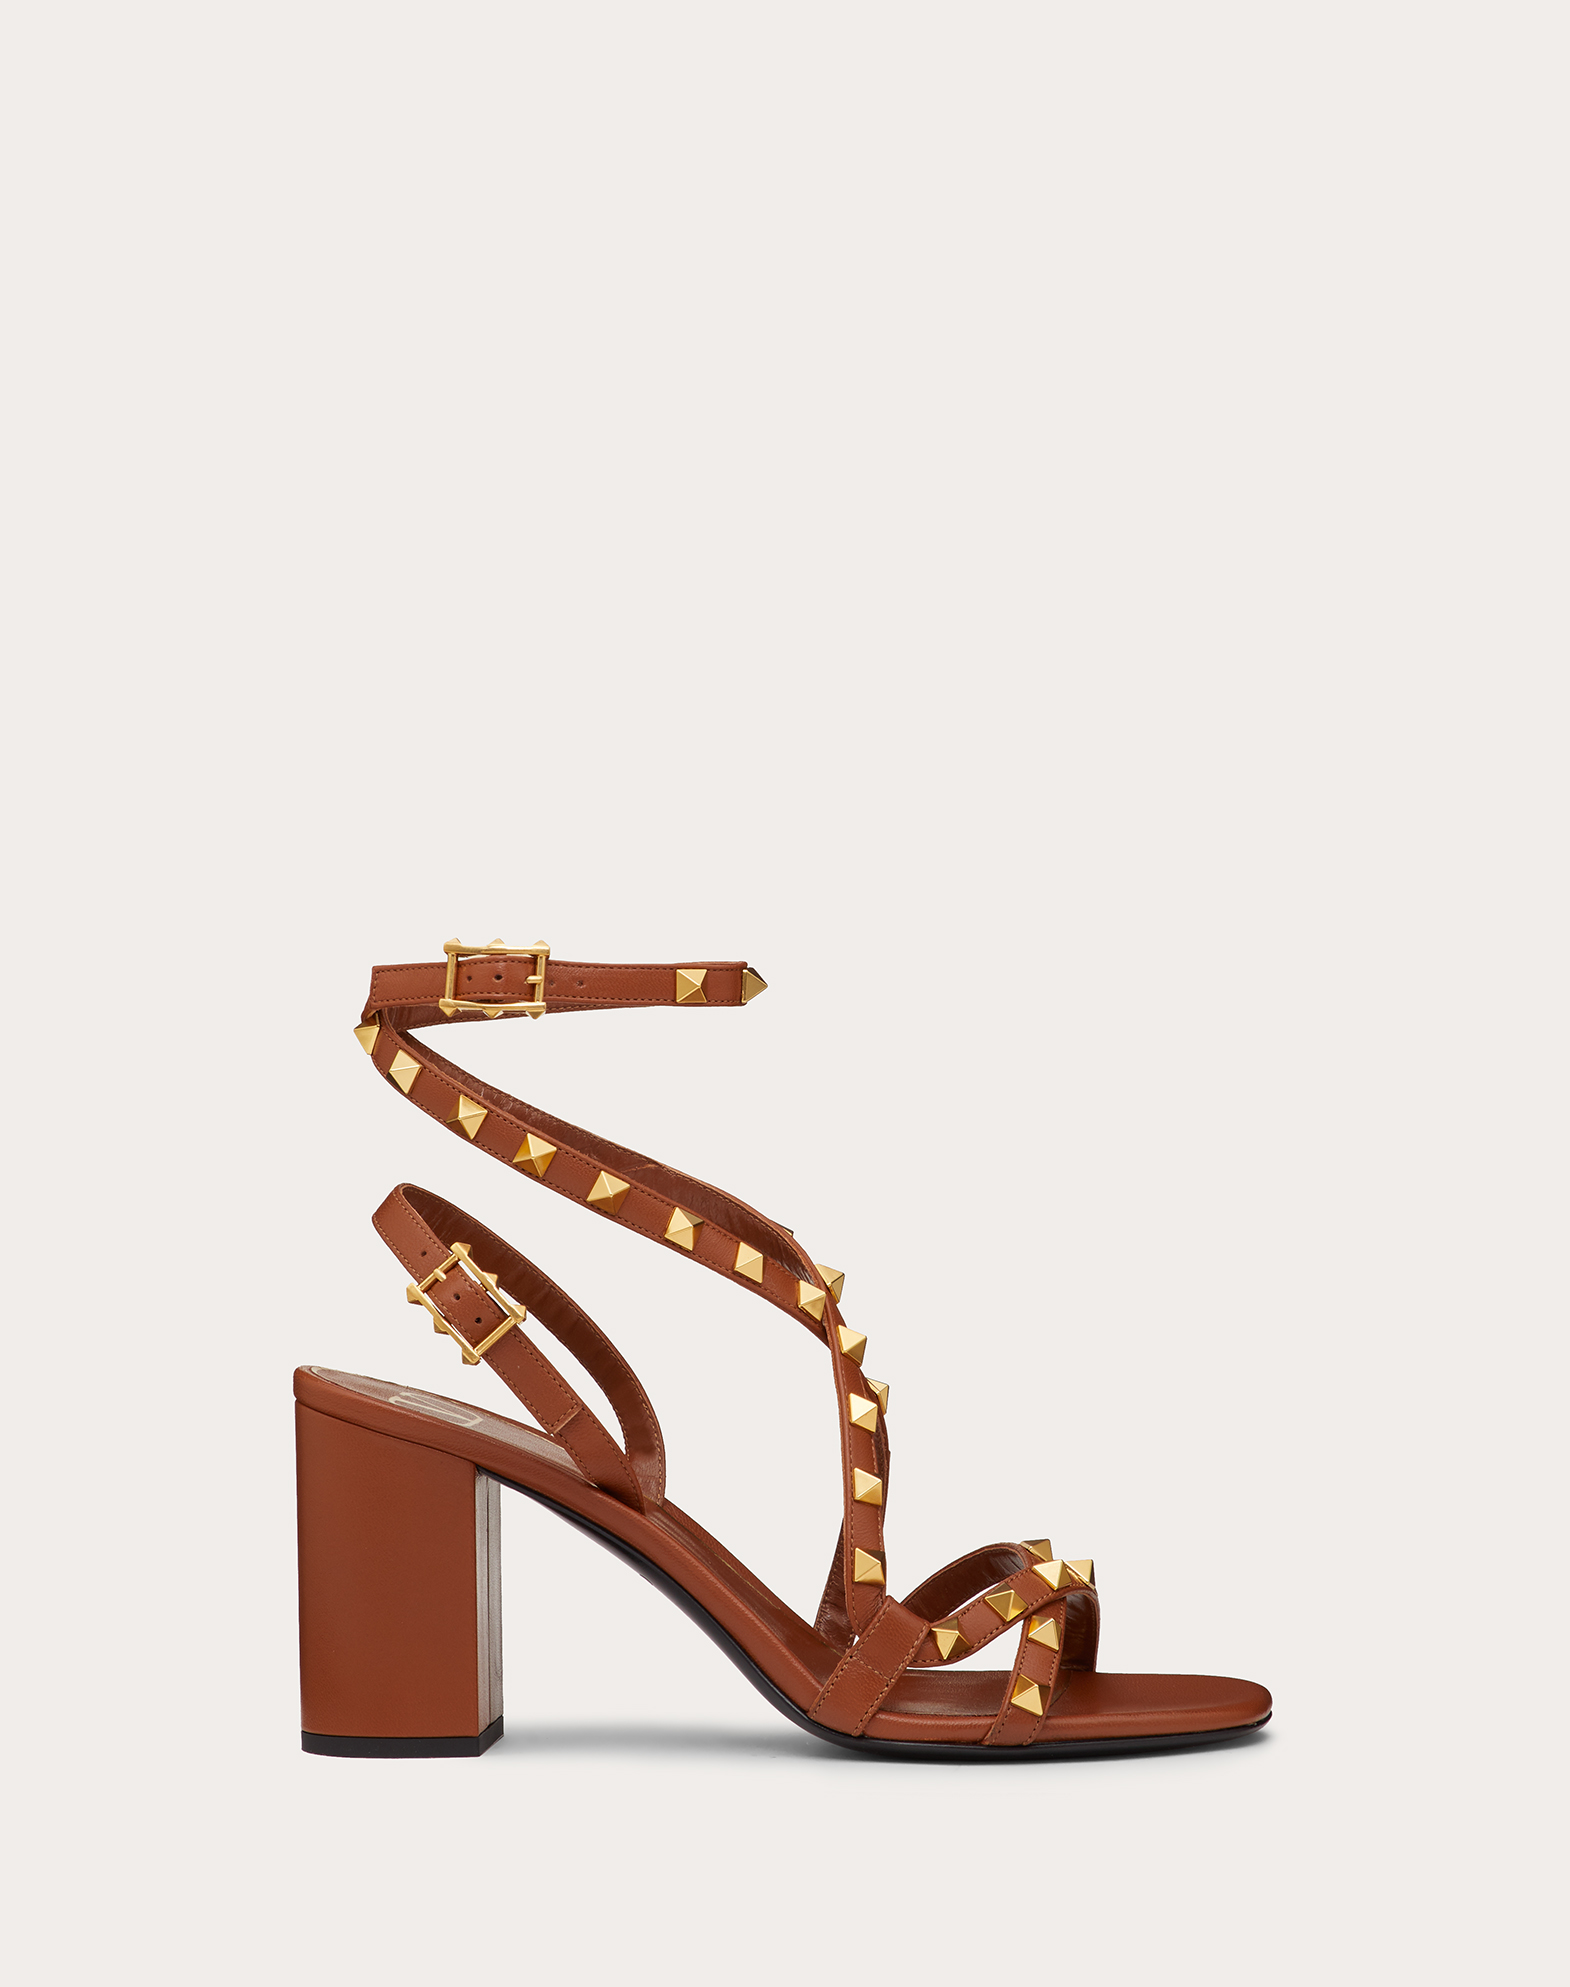 Rockstud Flair nappa sandal 80 mm